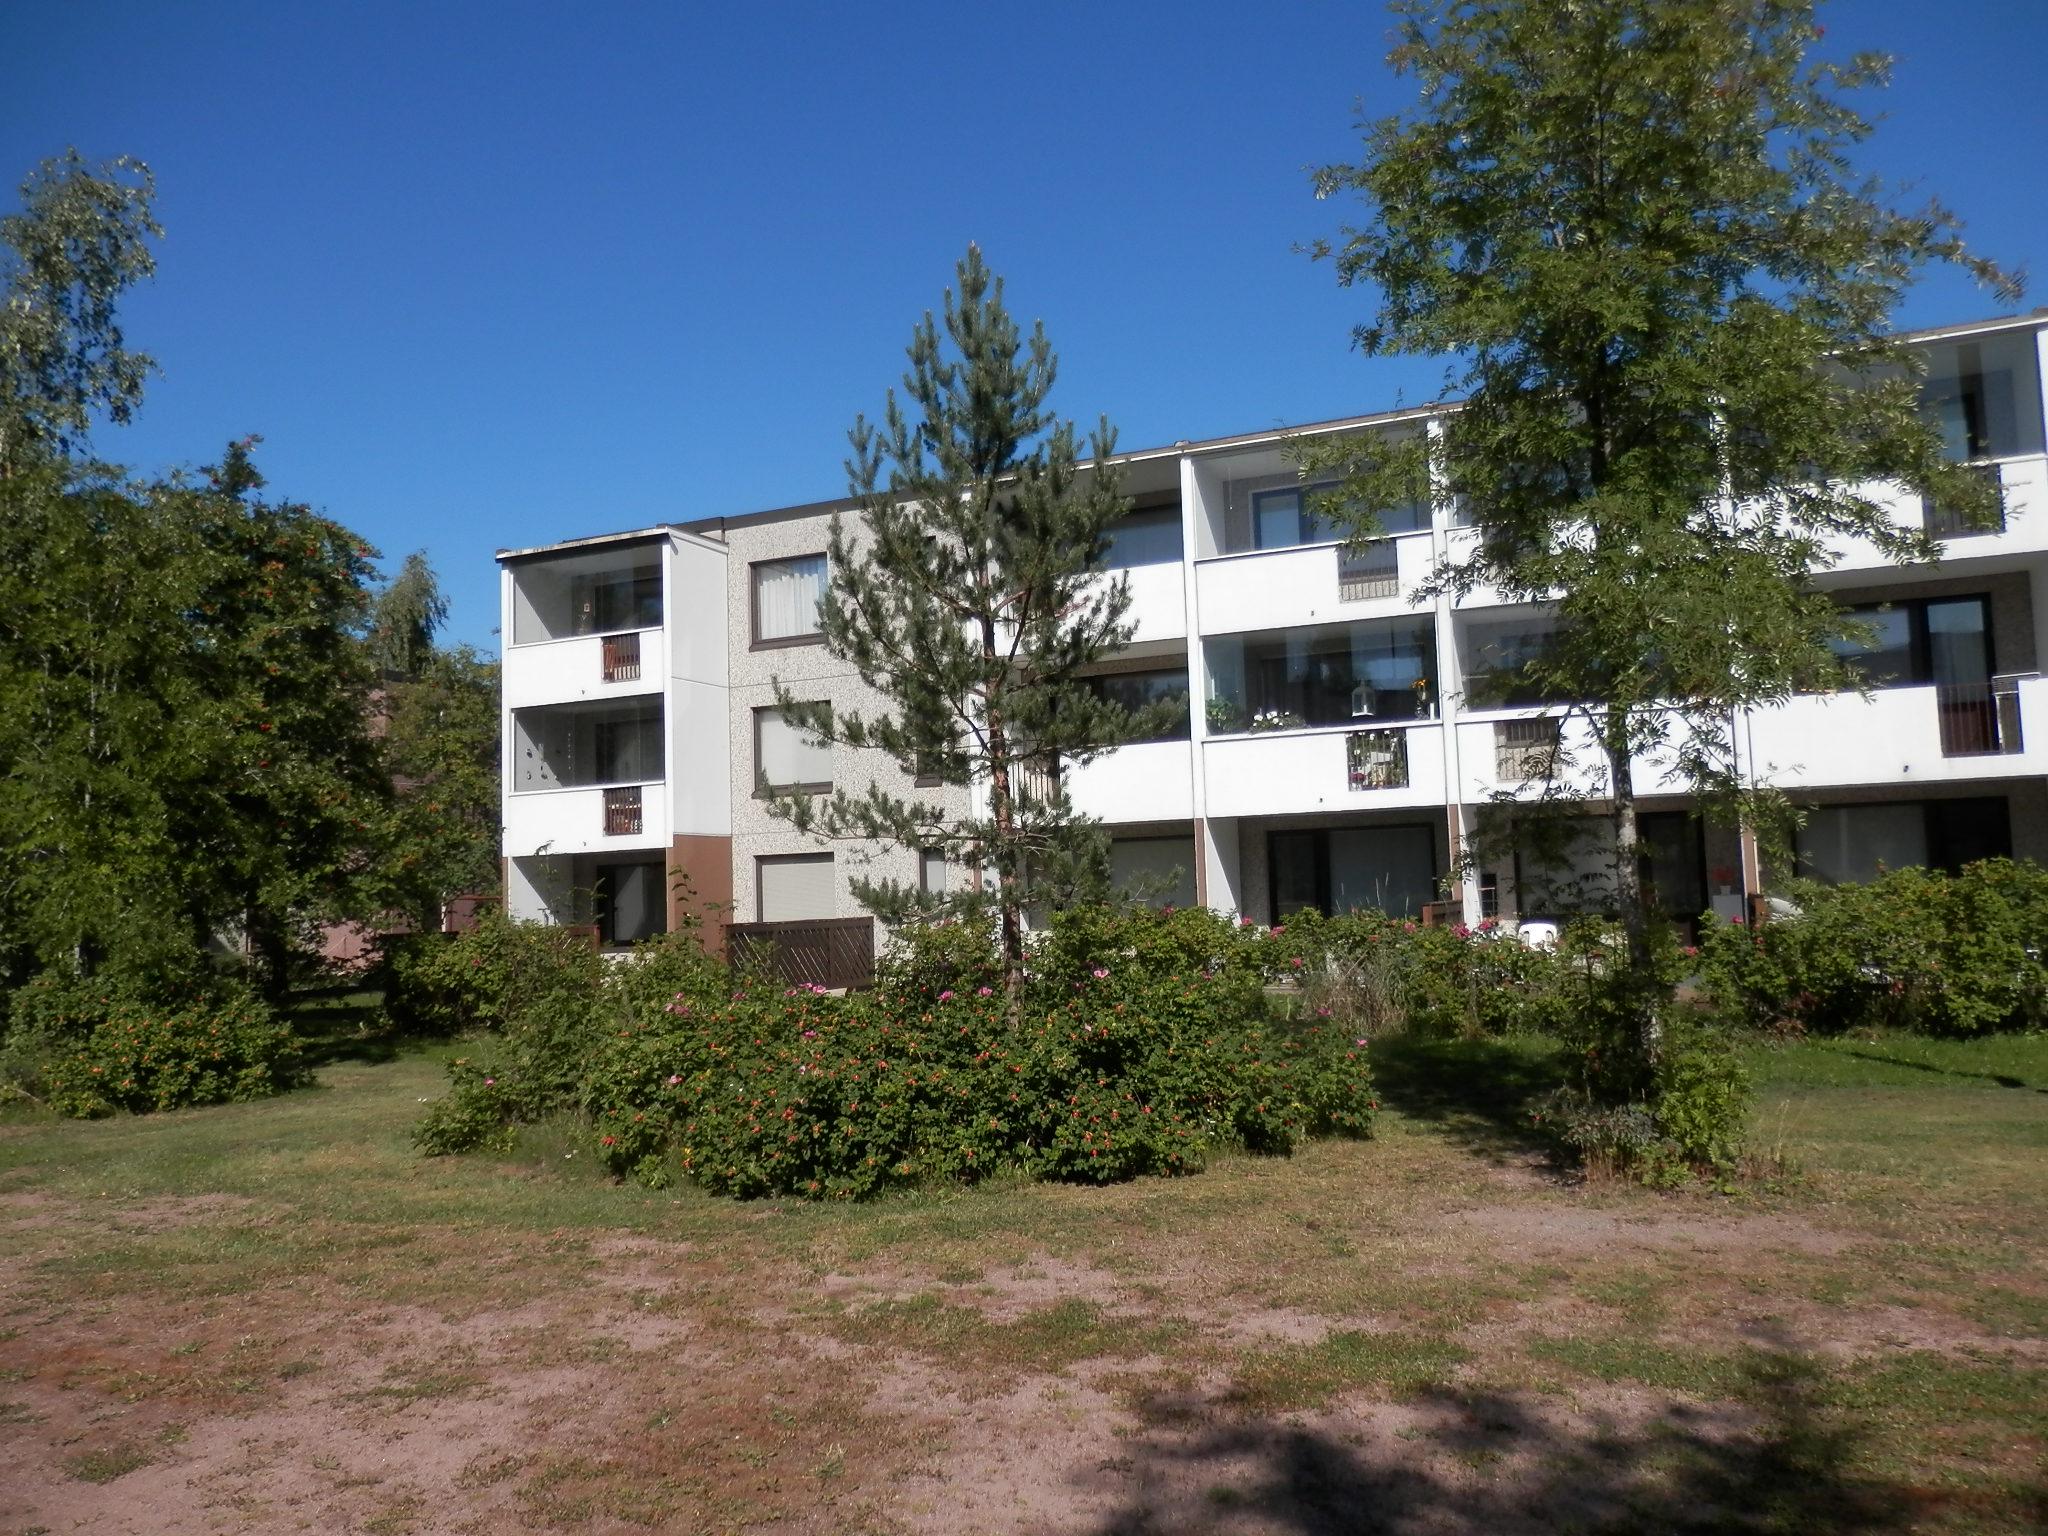 Nurmenpolku 6 C, Loimaa